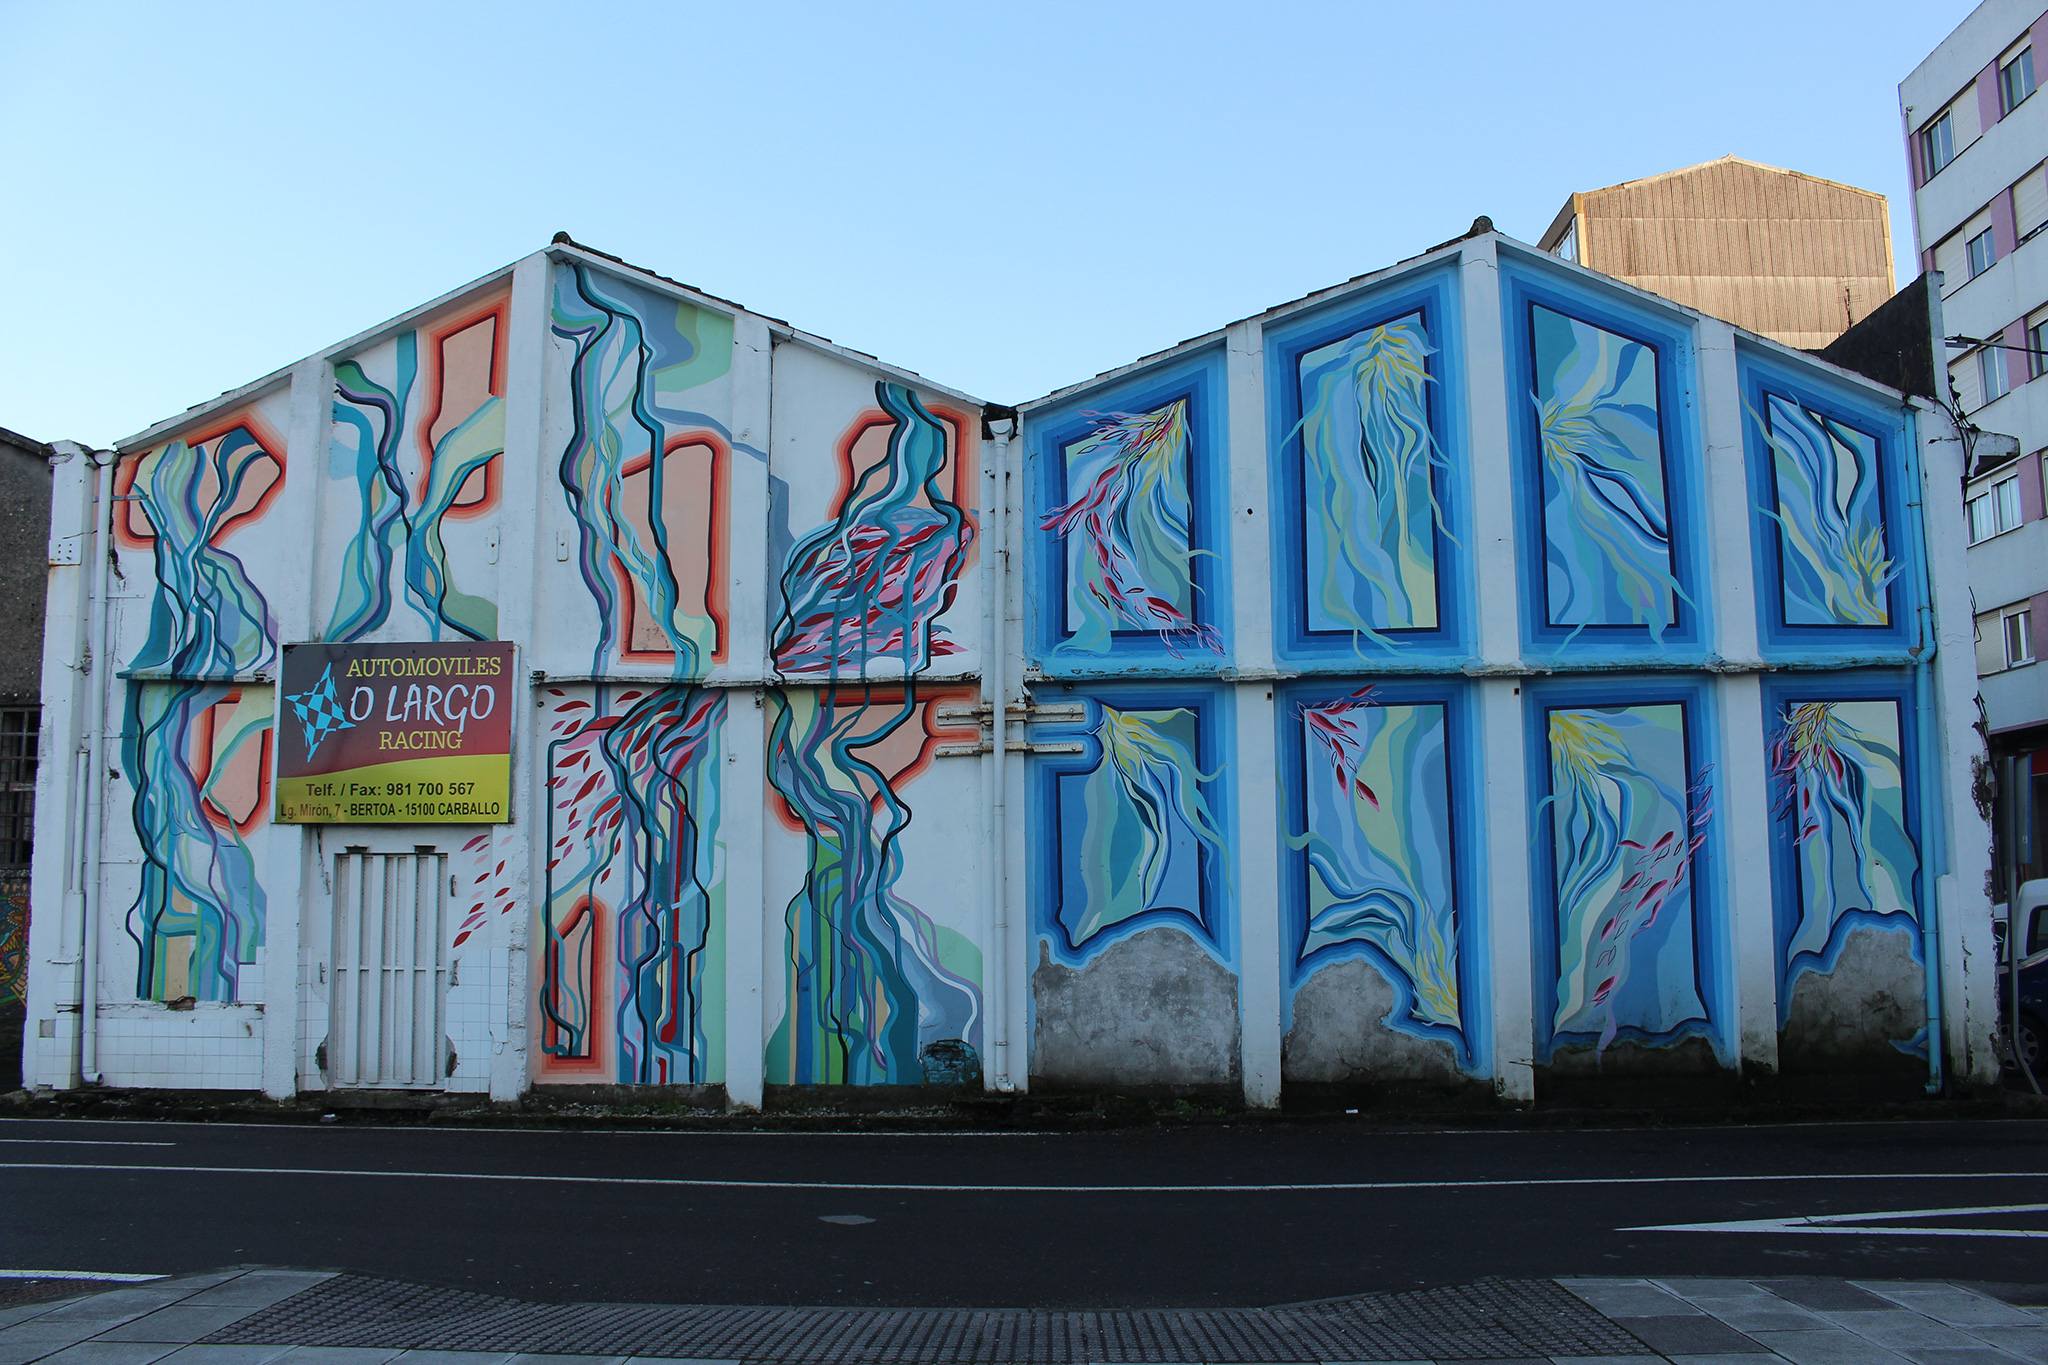 Foto principal mural A Harmonía do Contraste